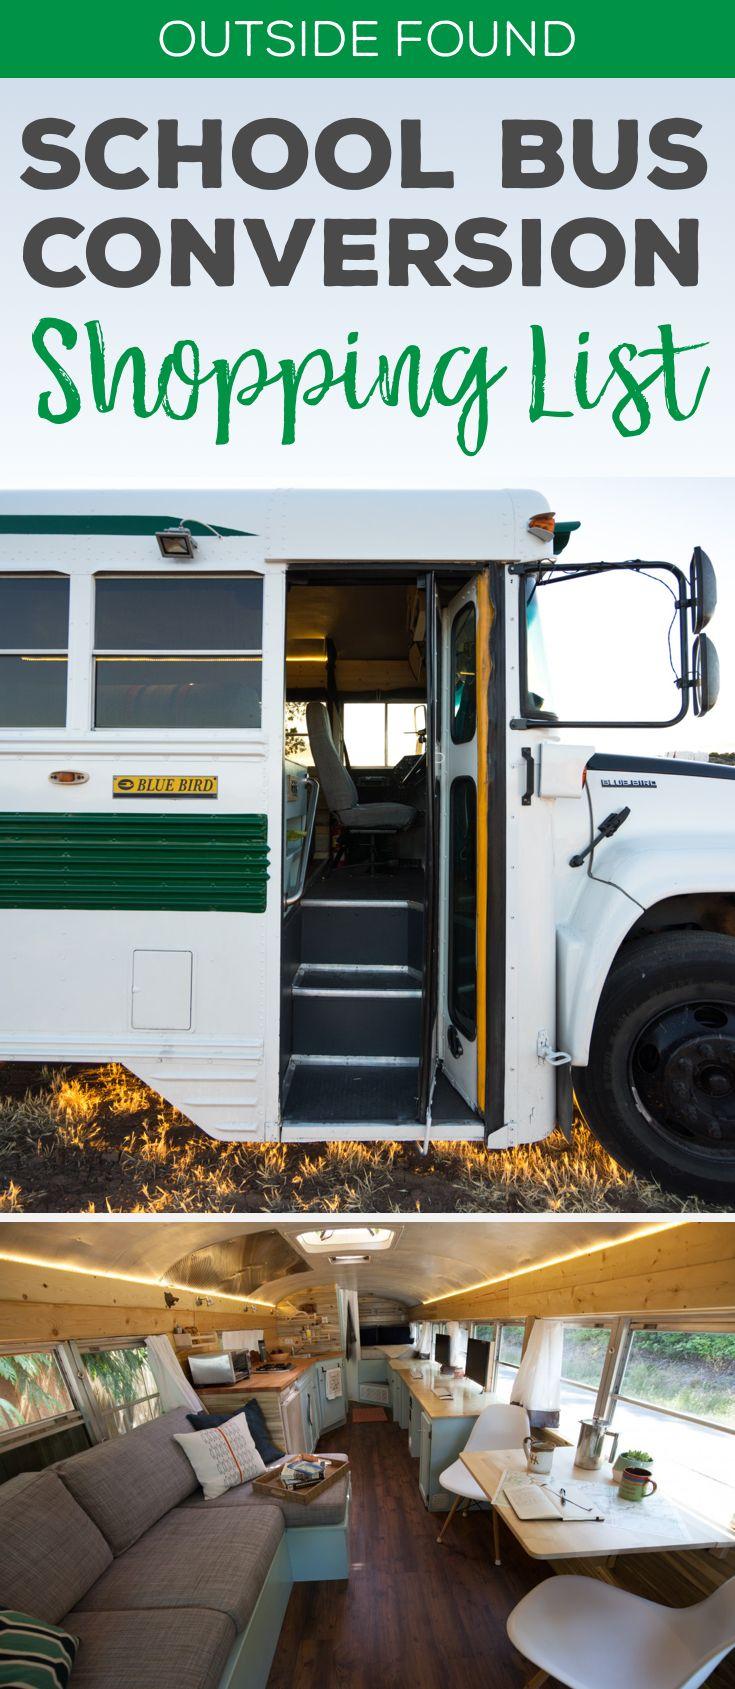 bus hardware roundup life on wheels pinterest bus conversion school bus conversion and bus camper [ 735 x 1689 Pixel ]